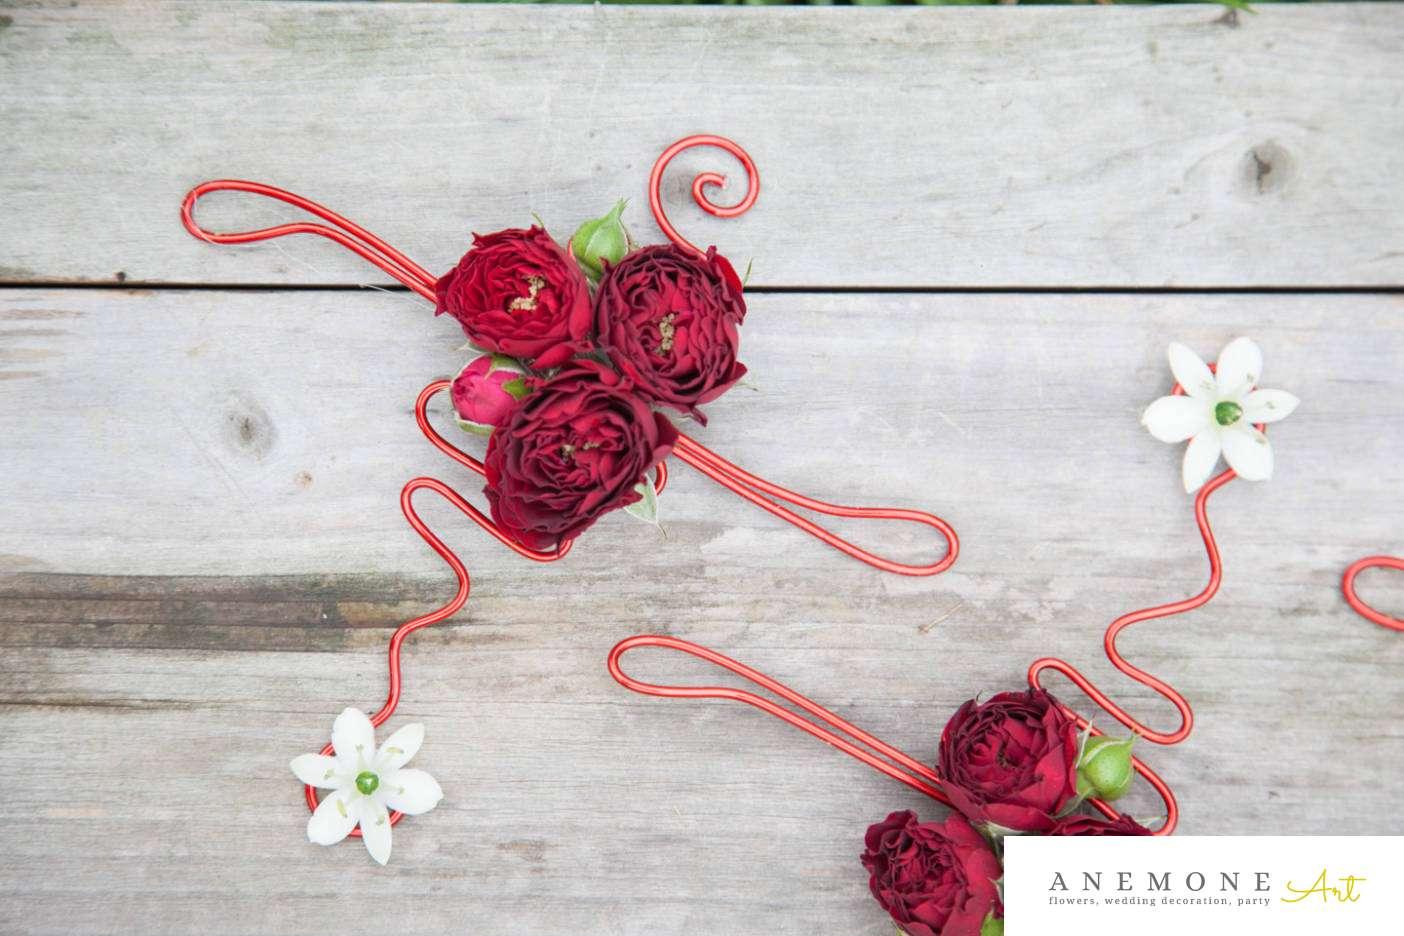 Poza, foto cu Flori de nunta bratara, mini-rosa in Arad, Timisoara, Oradea (wedding flowers, bouquets) nunta Arad, Timisoara, Oradea